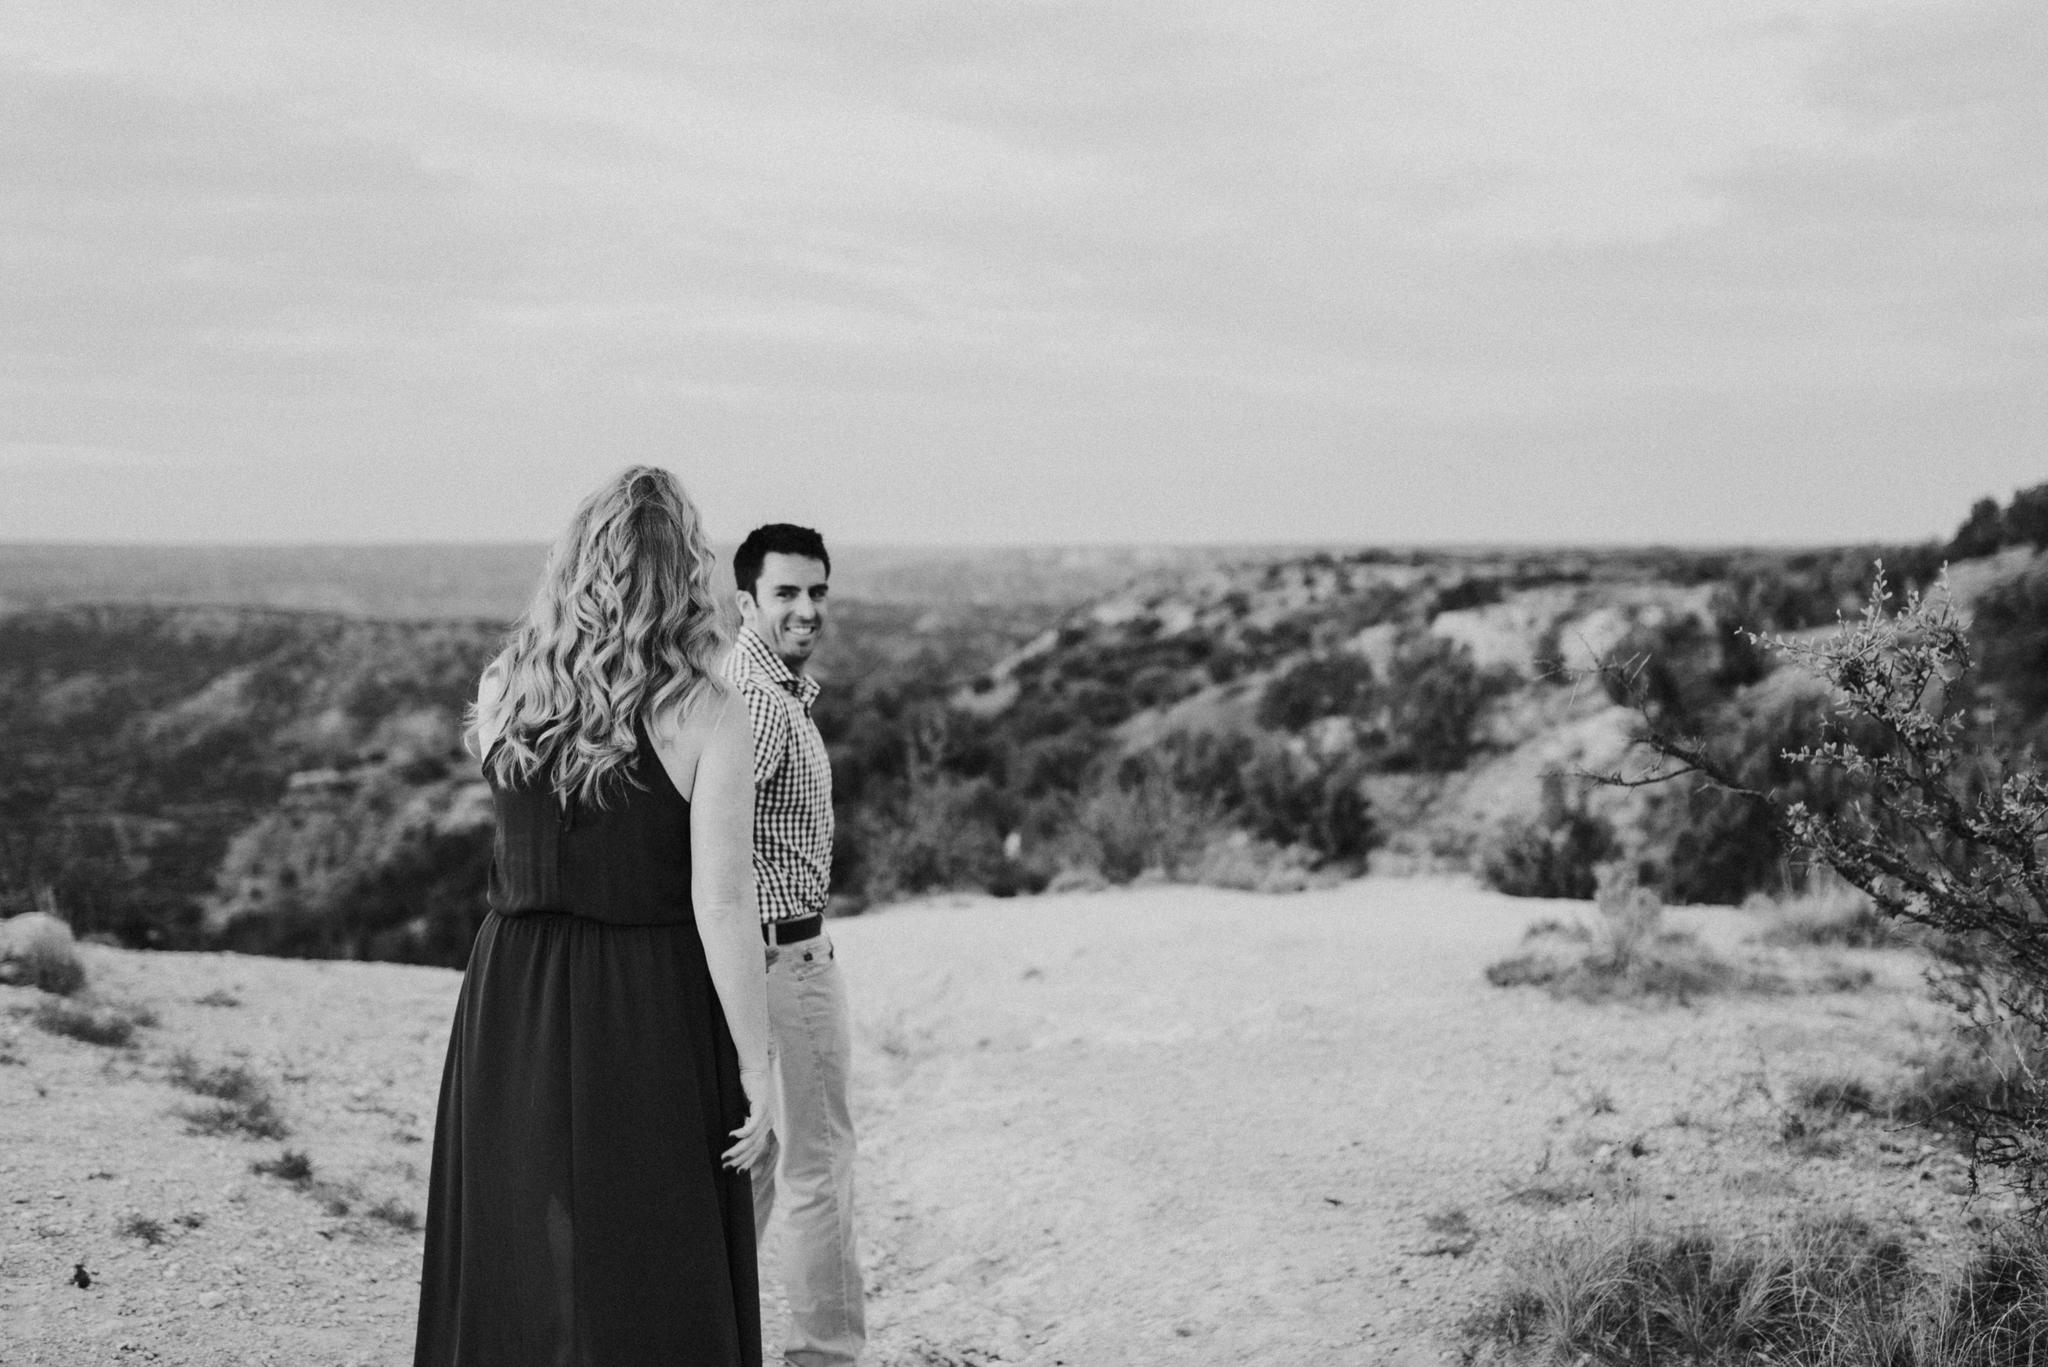 Houston Wedding Photographer-Palo Duro Canyon Engagement Session- Houston Wedding Photographer -Kristen Giles Photography-1.jpg